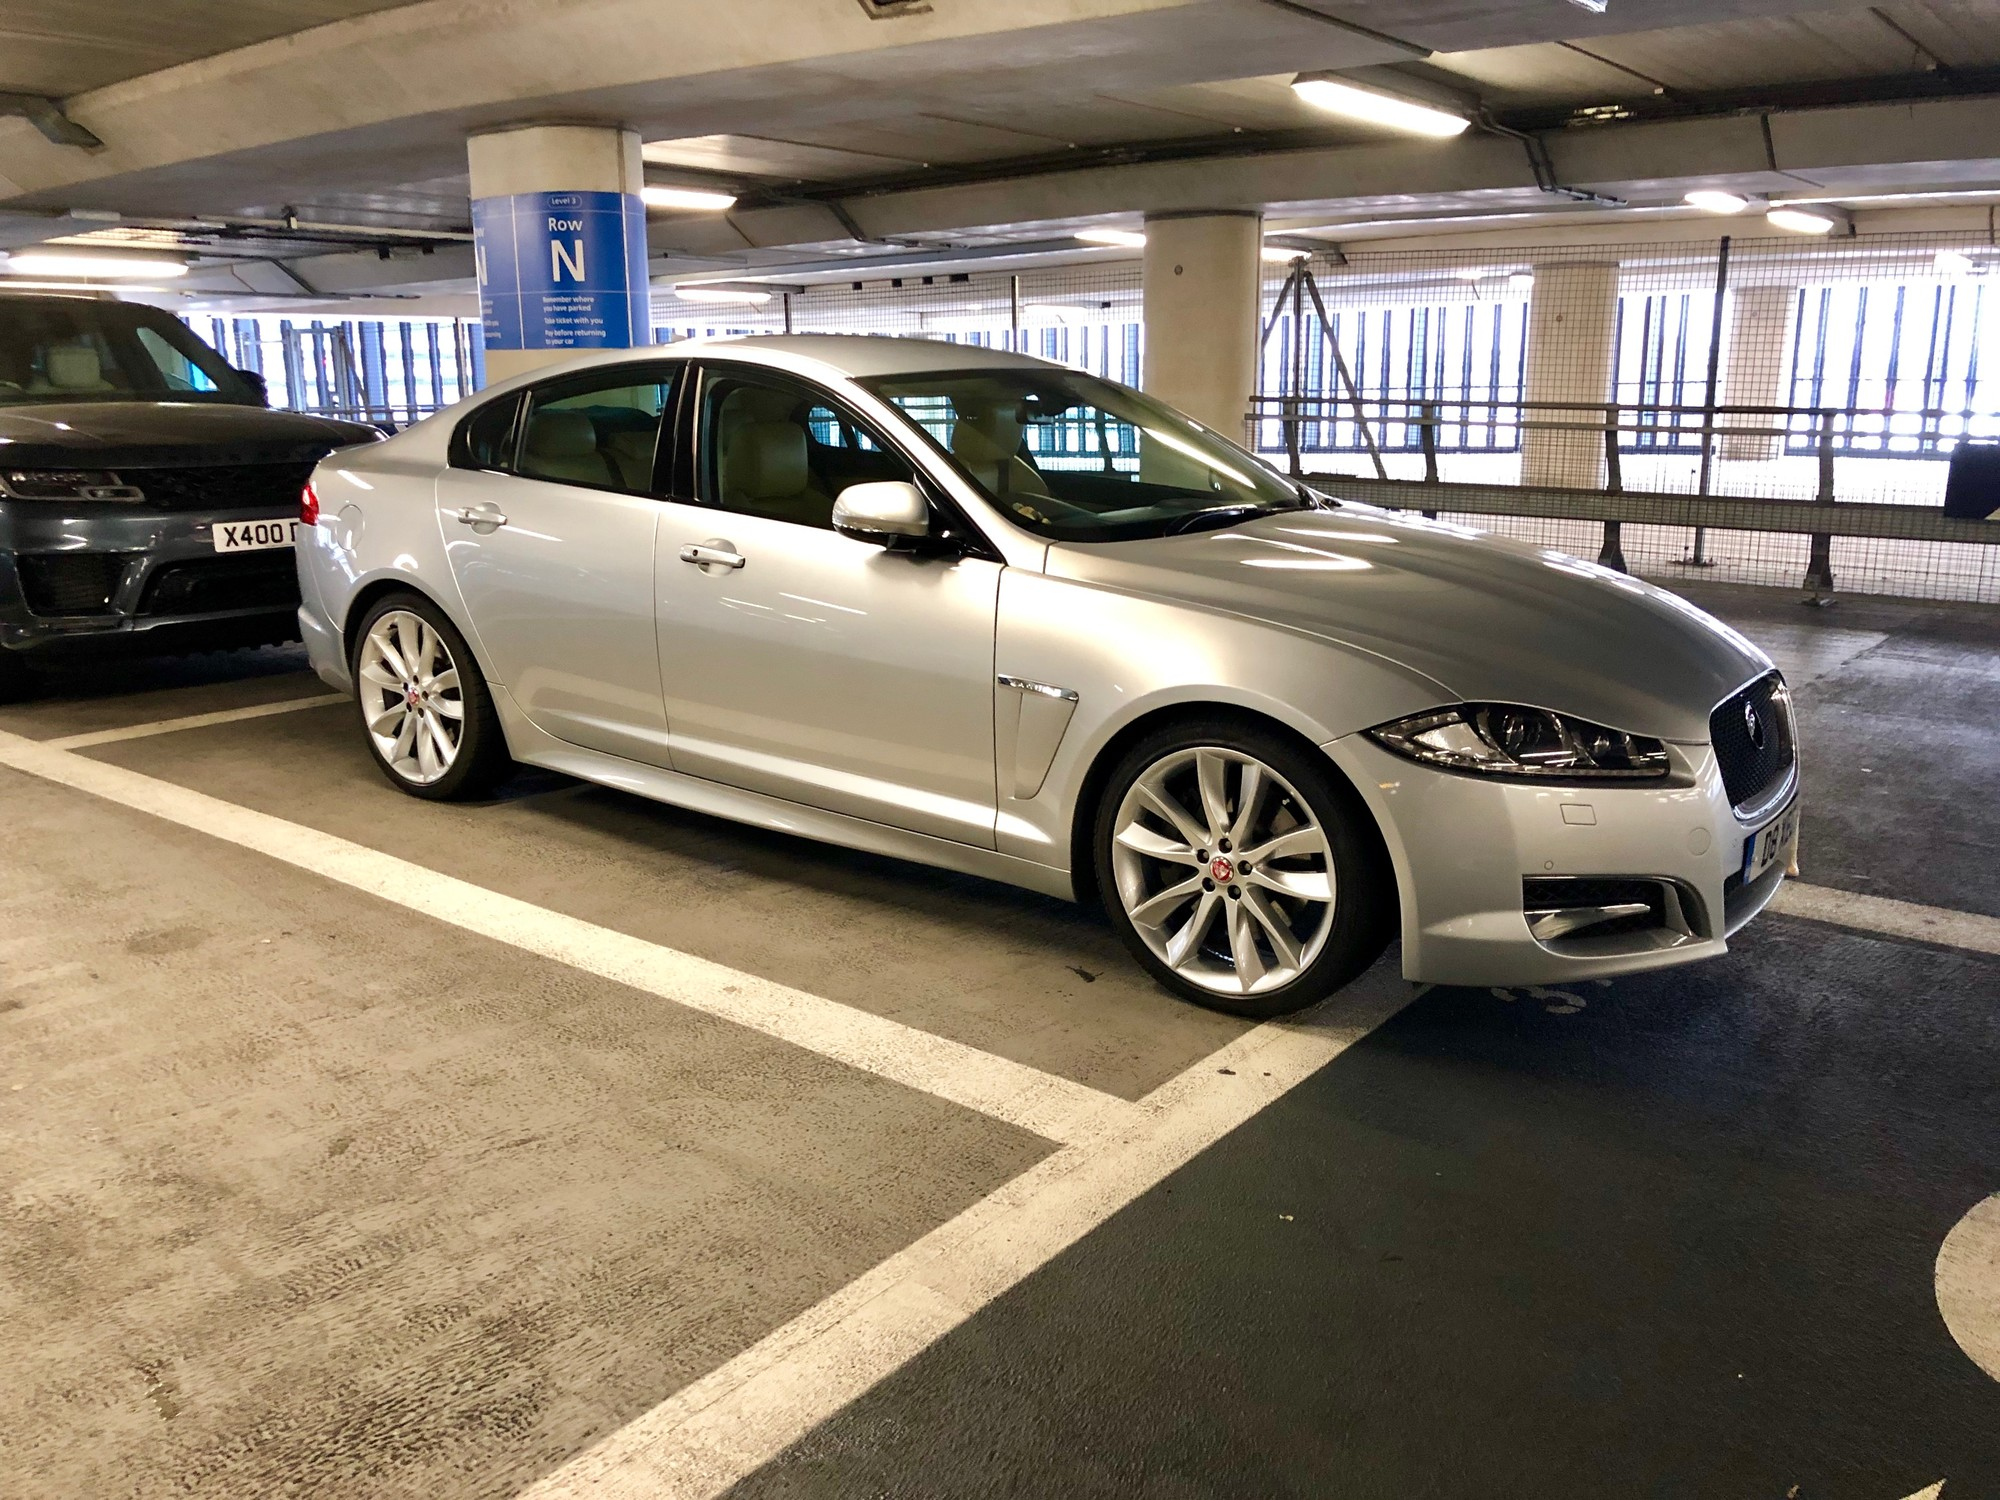 Jaguar XFS in a car park